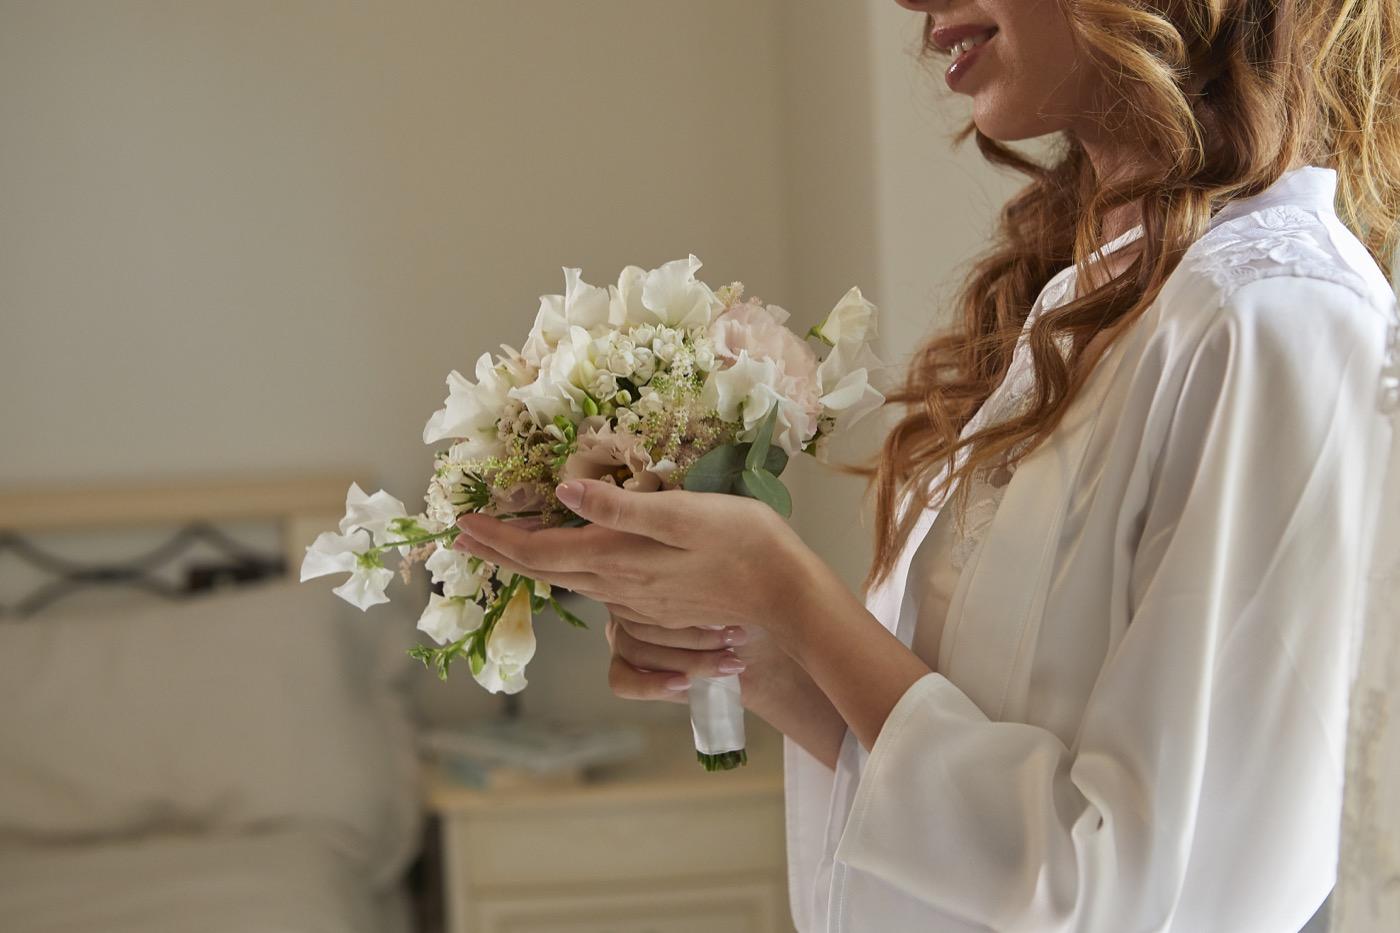 Claudio-Coppola-wedding-photographer-abbazia-7-frati-piegaro-31